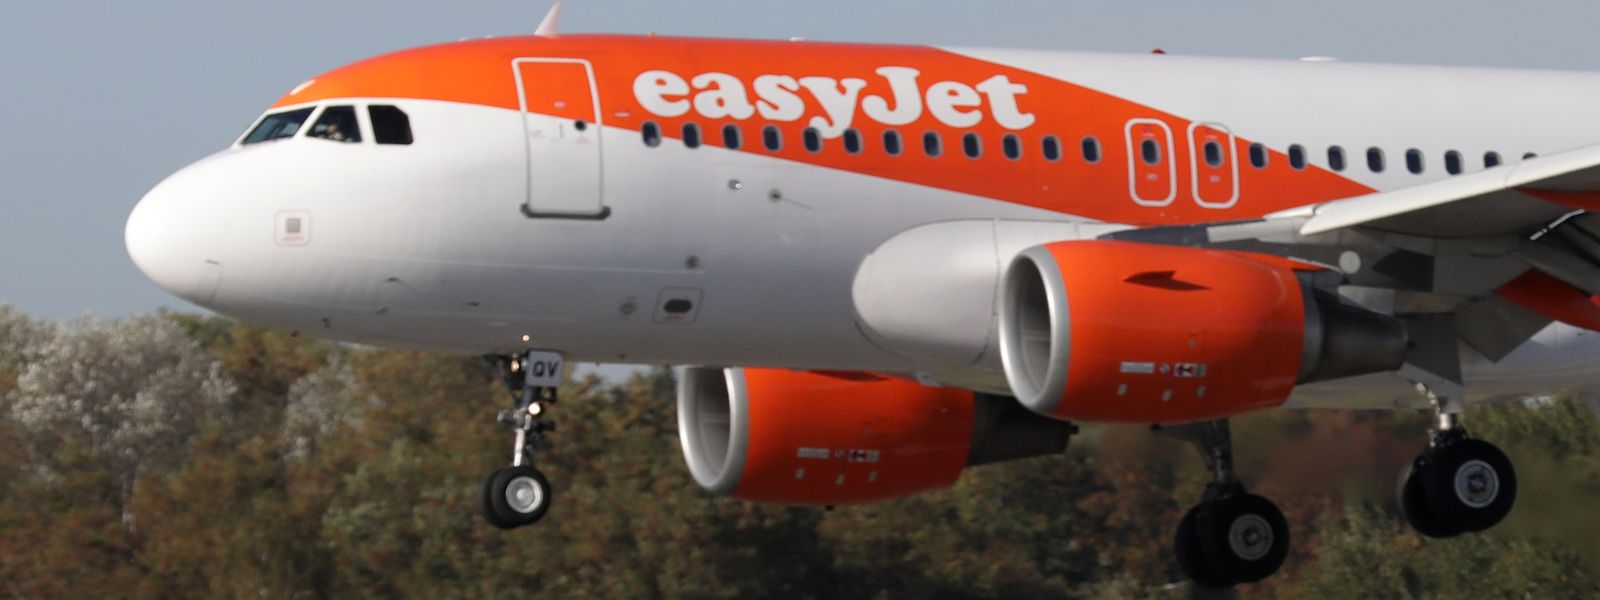 Easyjet hatte im Juni fast 1,6 Millionen Passagiere.